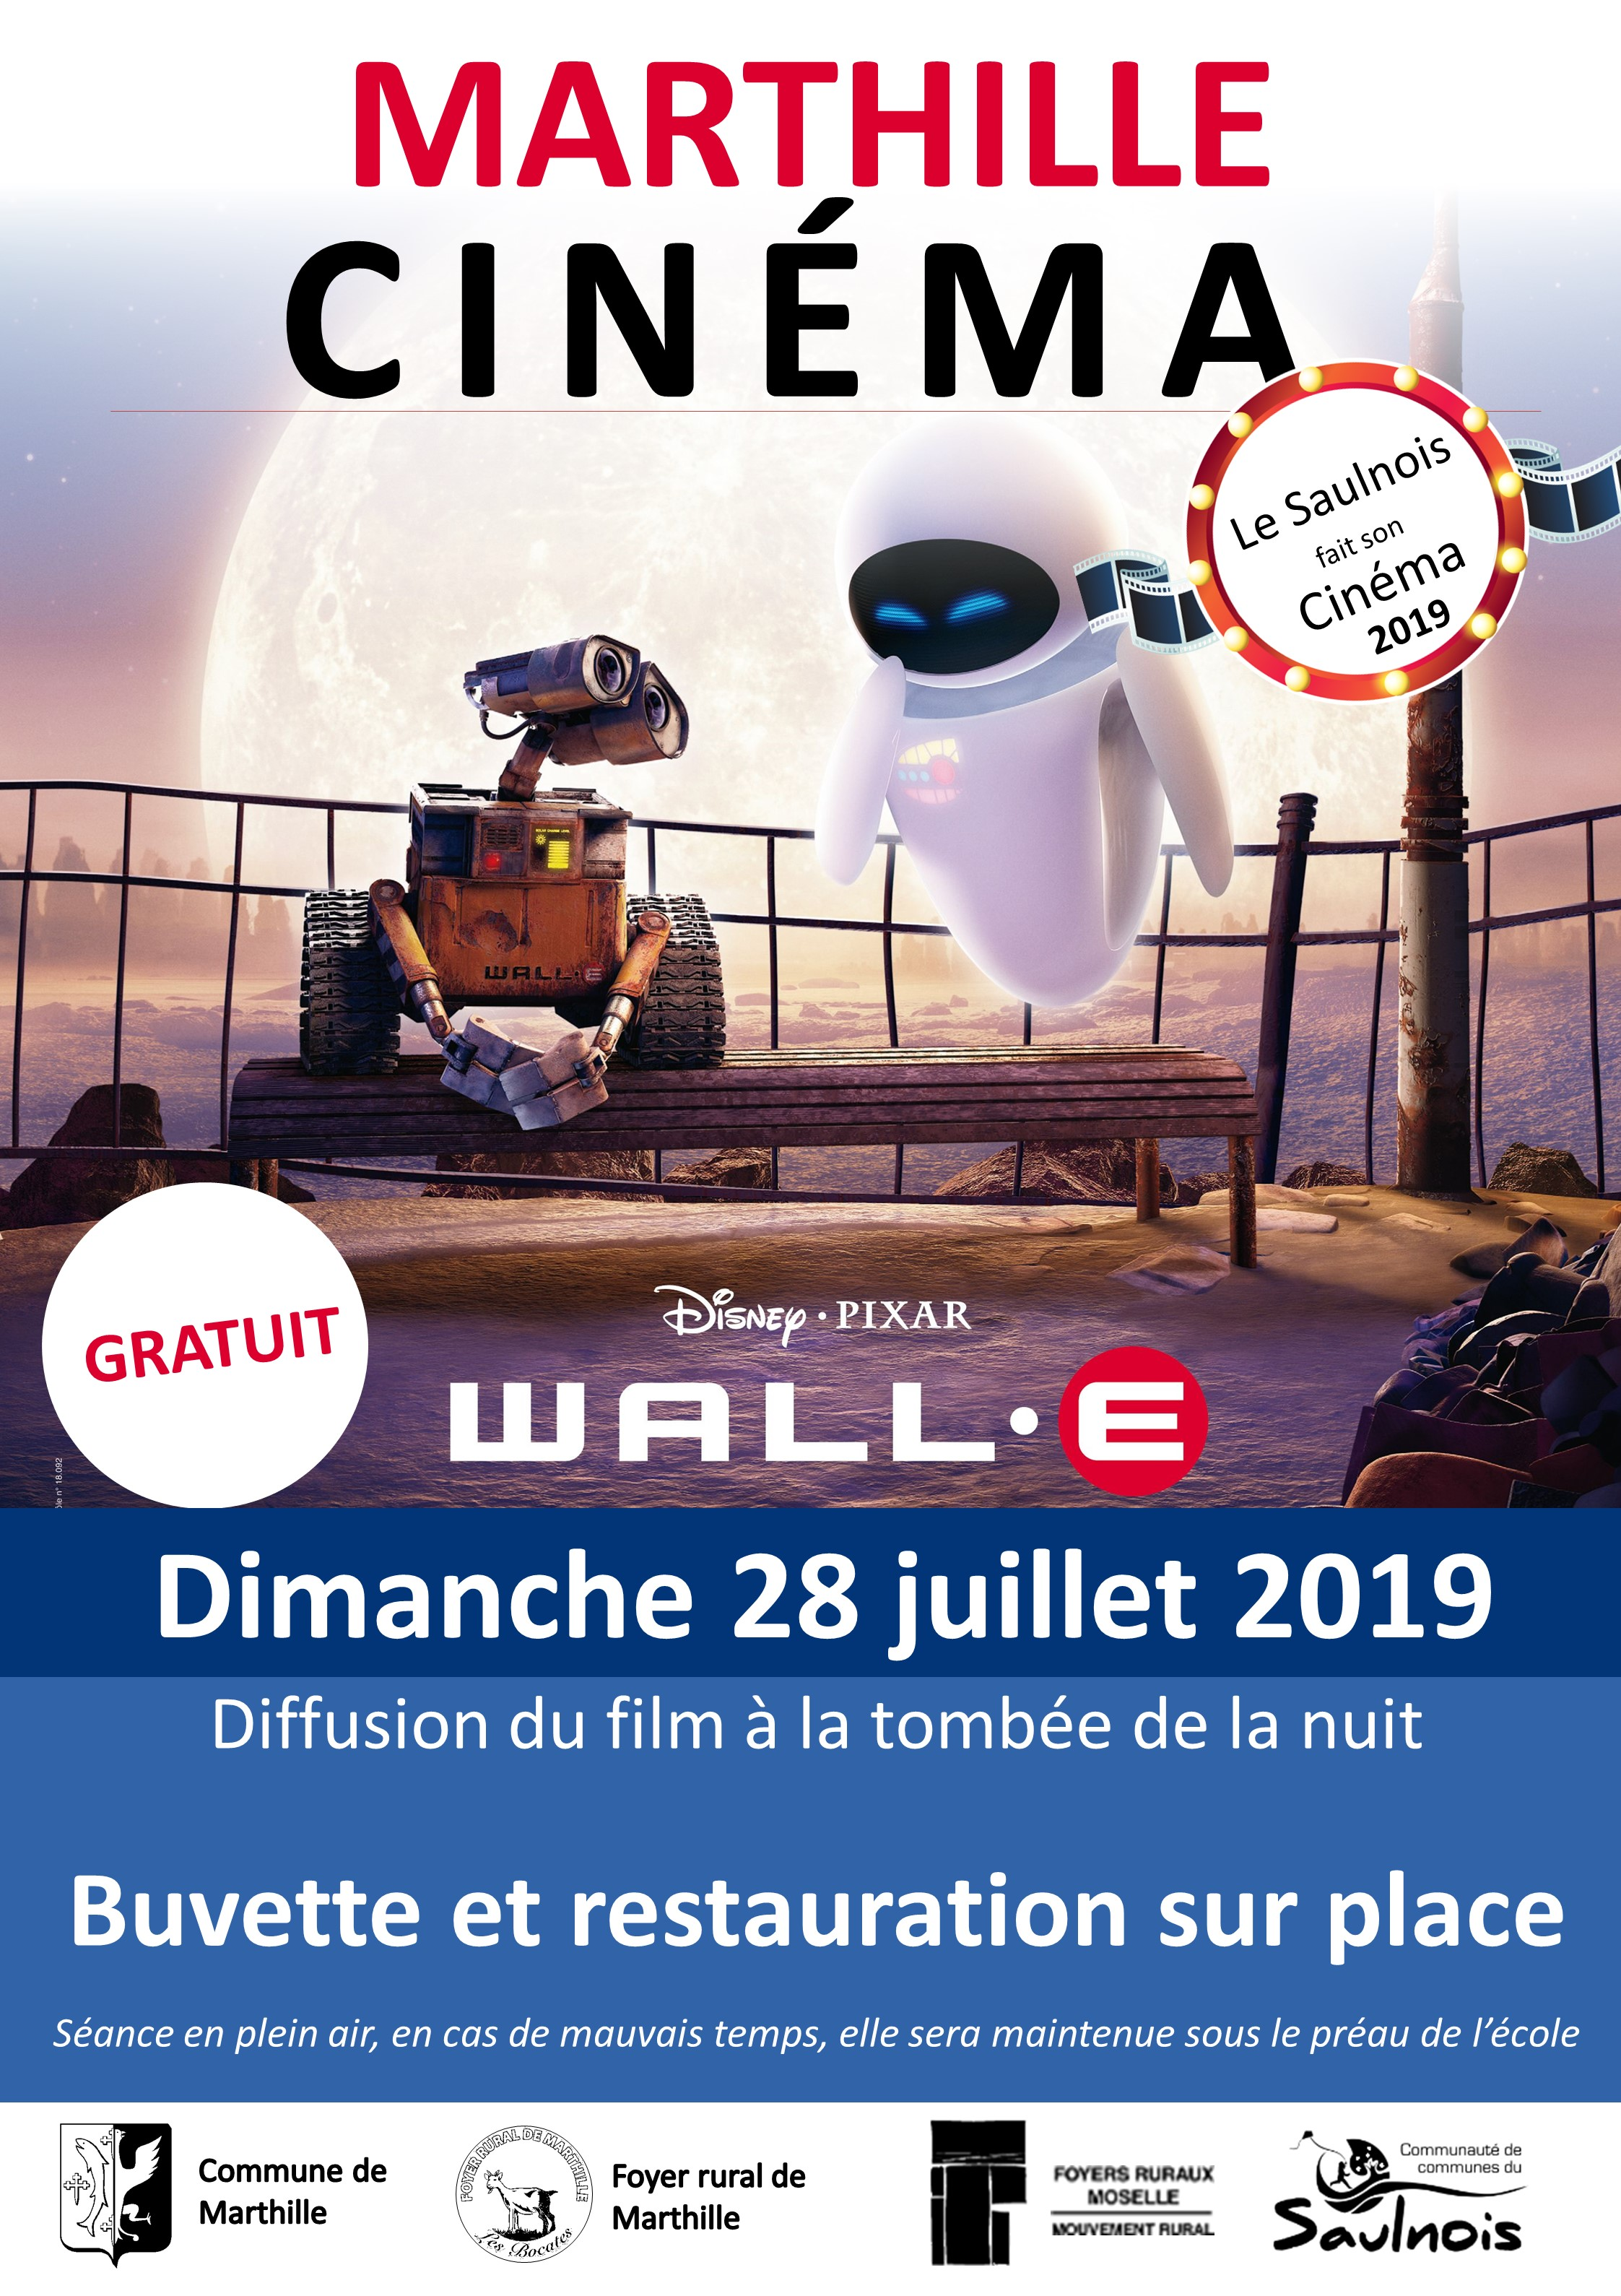 LE SAULNOIS FAIT SON CINEMA: WALL-E